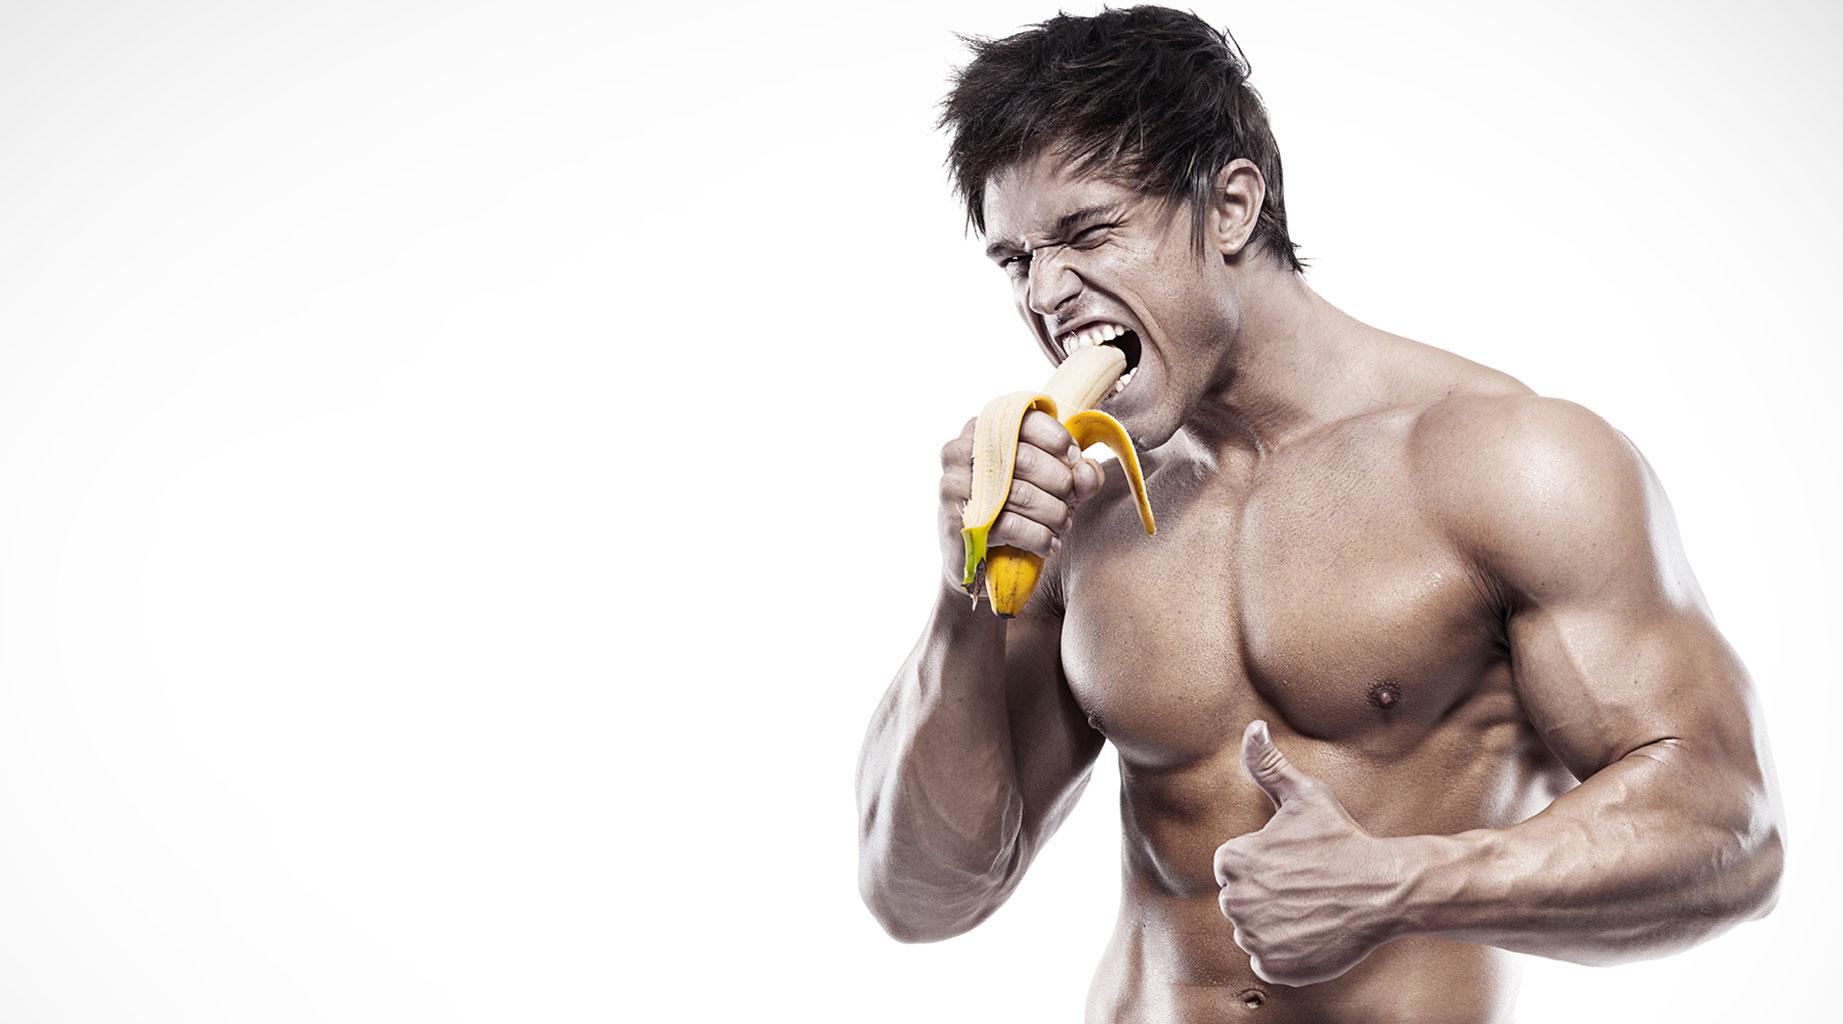 Атлет ест банан